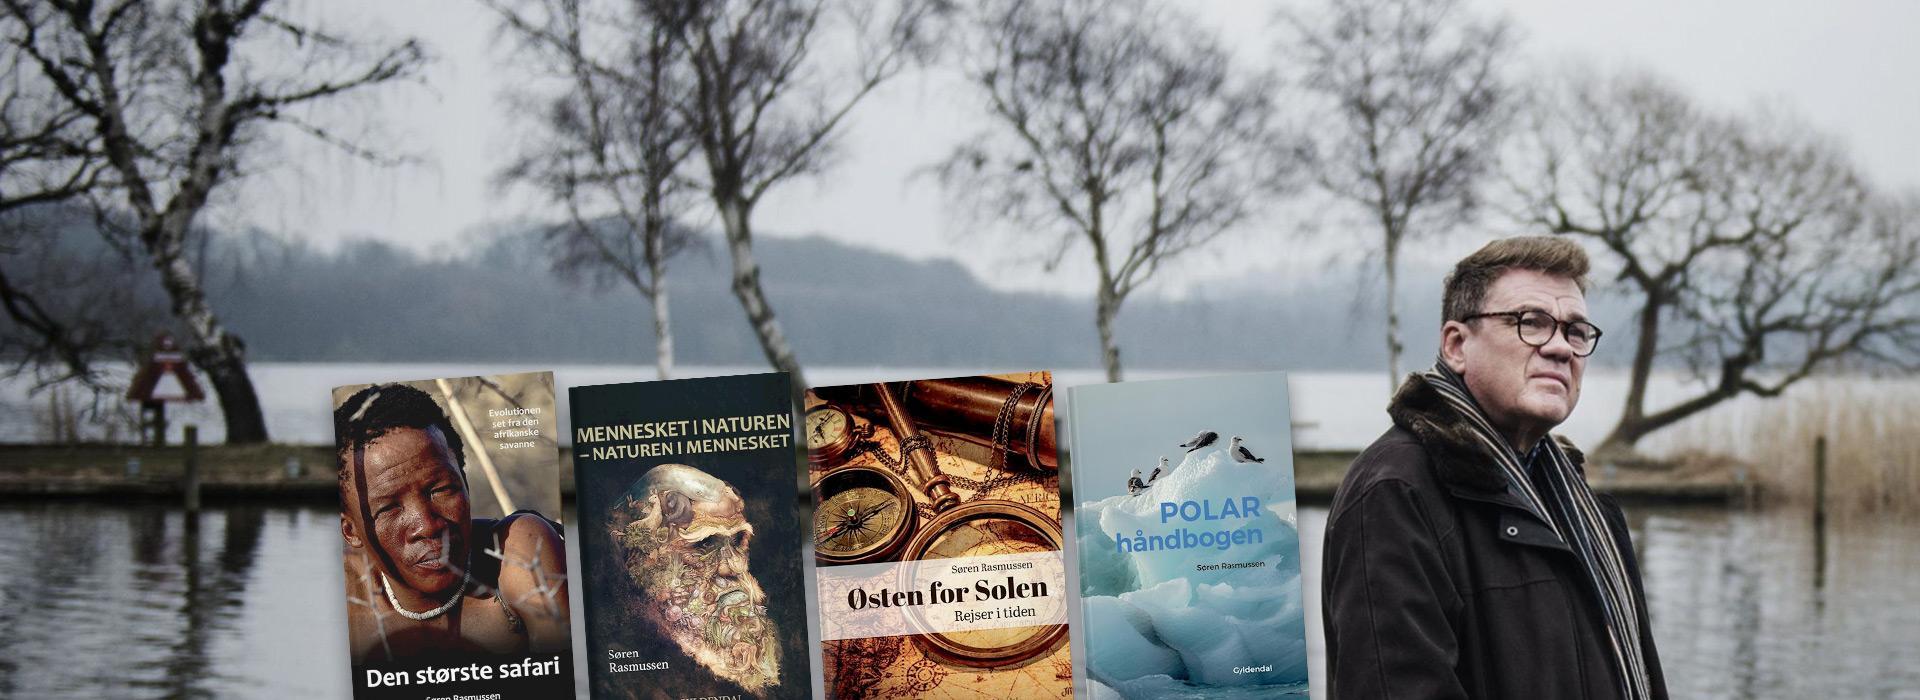 Søren Rasmussen Bøger